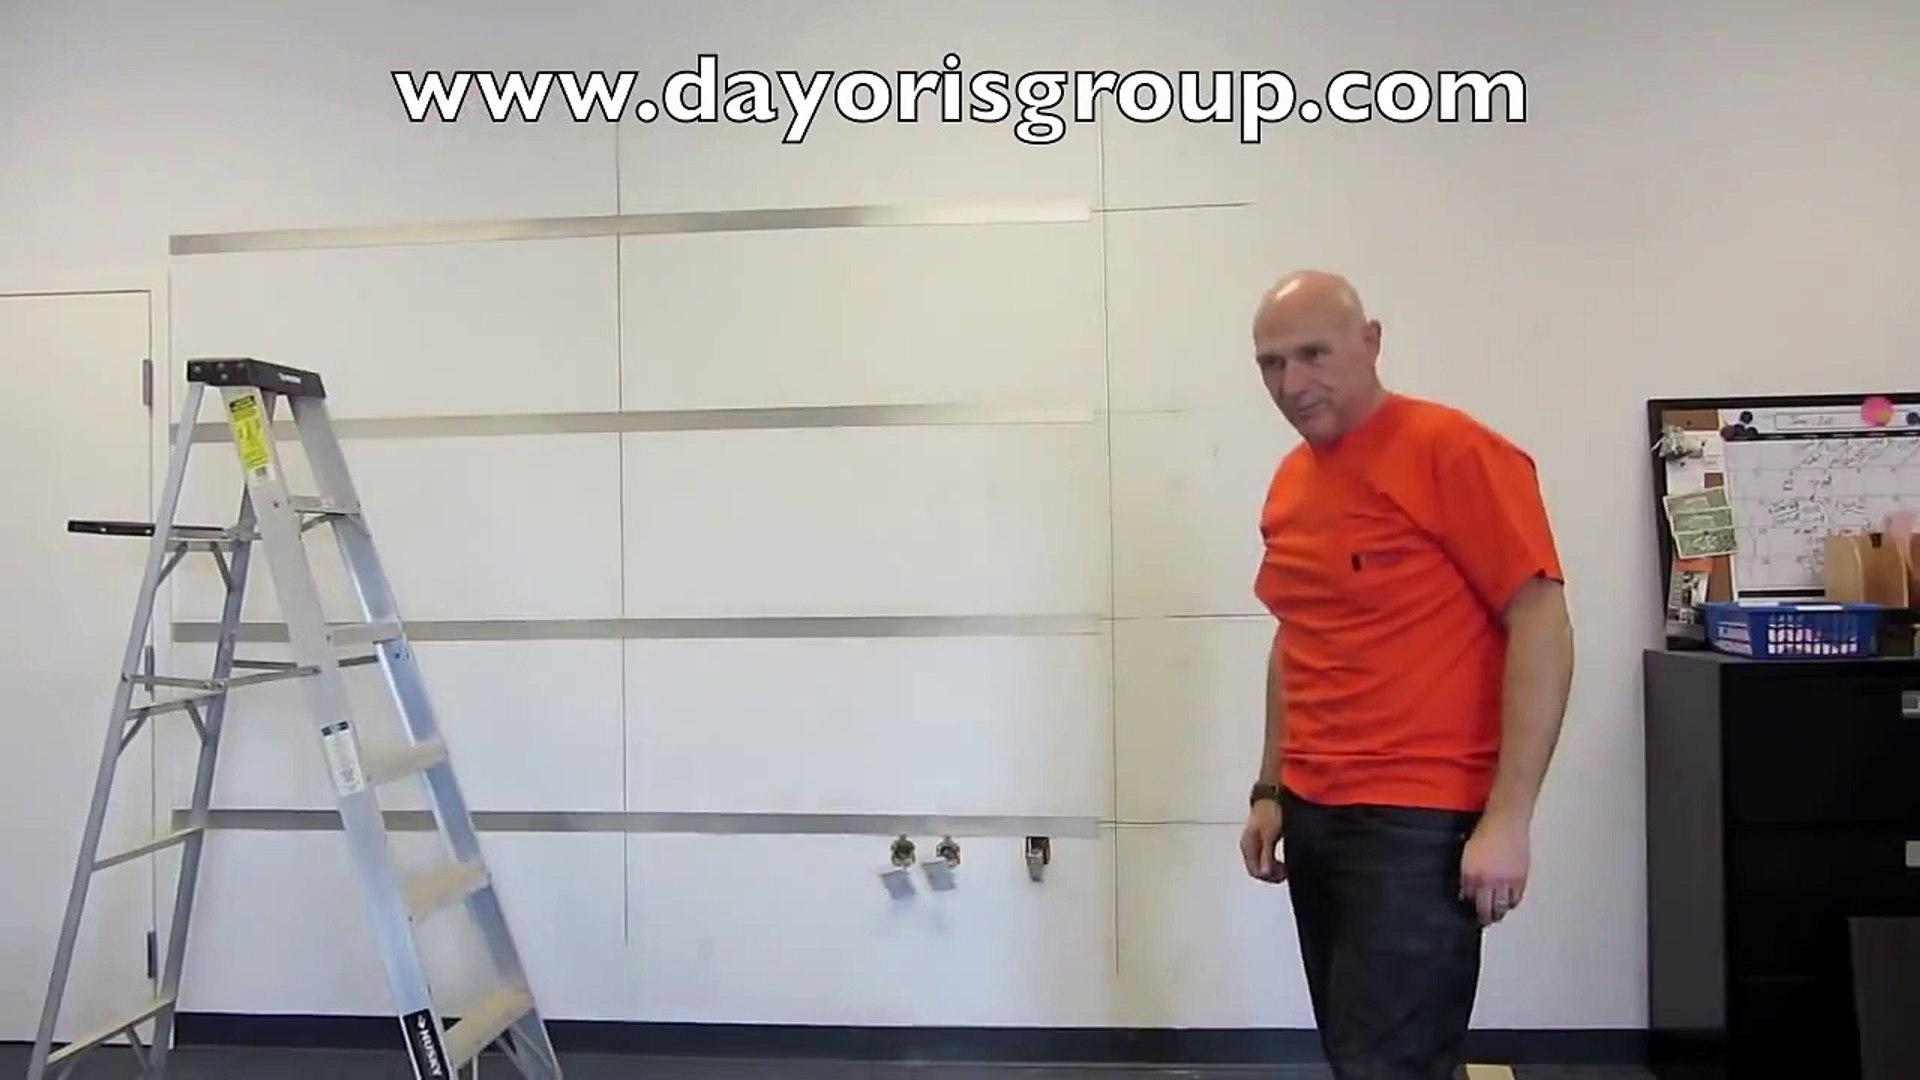 Modern Panels - Wall panel installation-DAYORIS Group